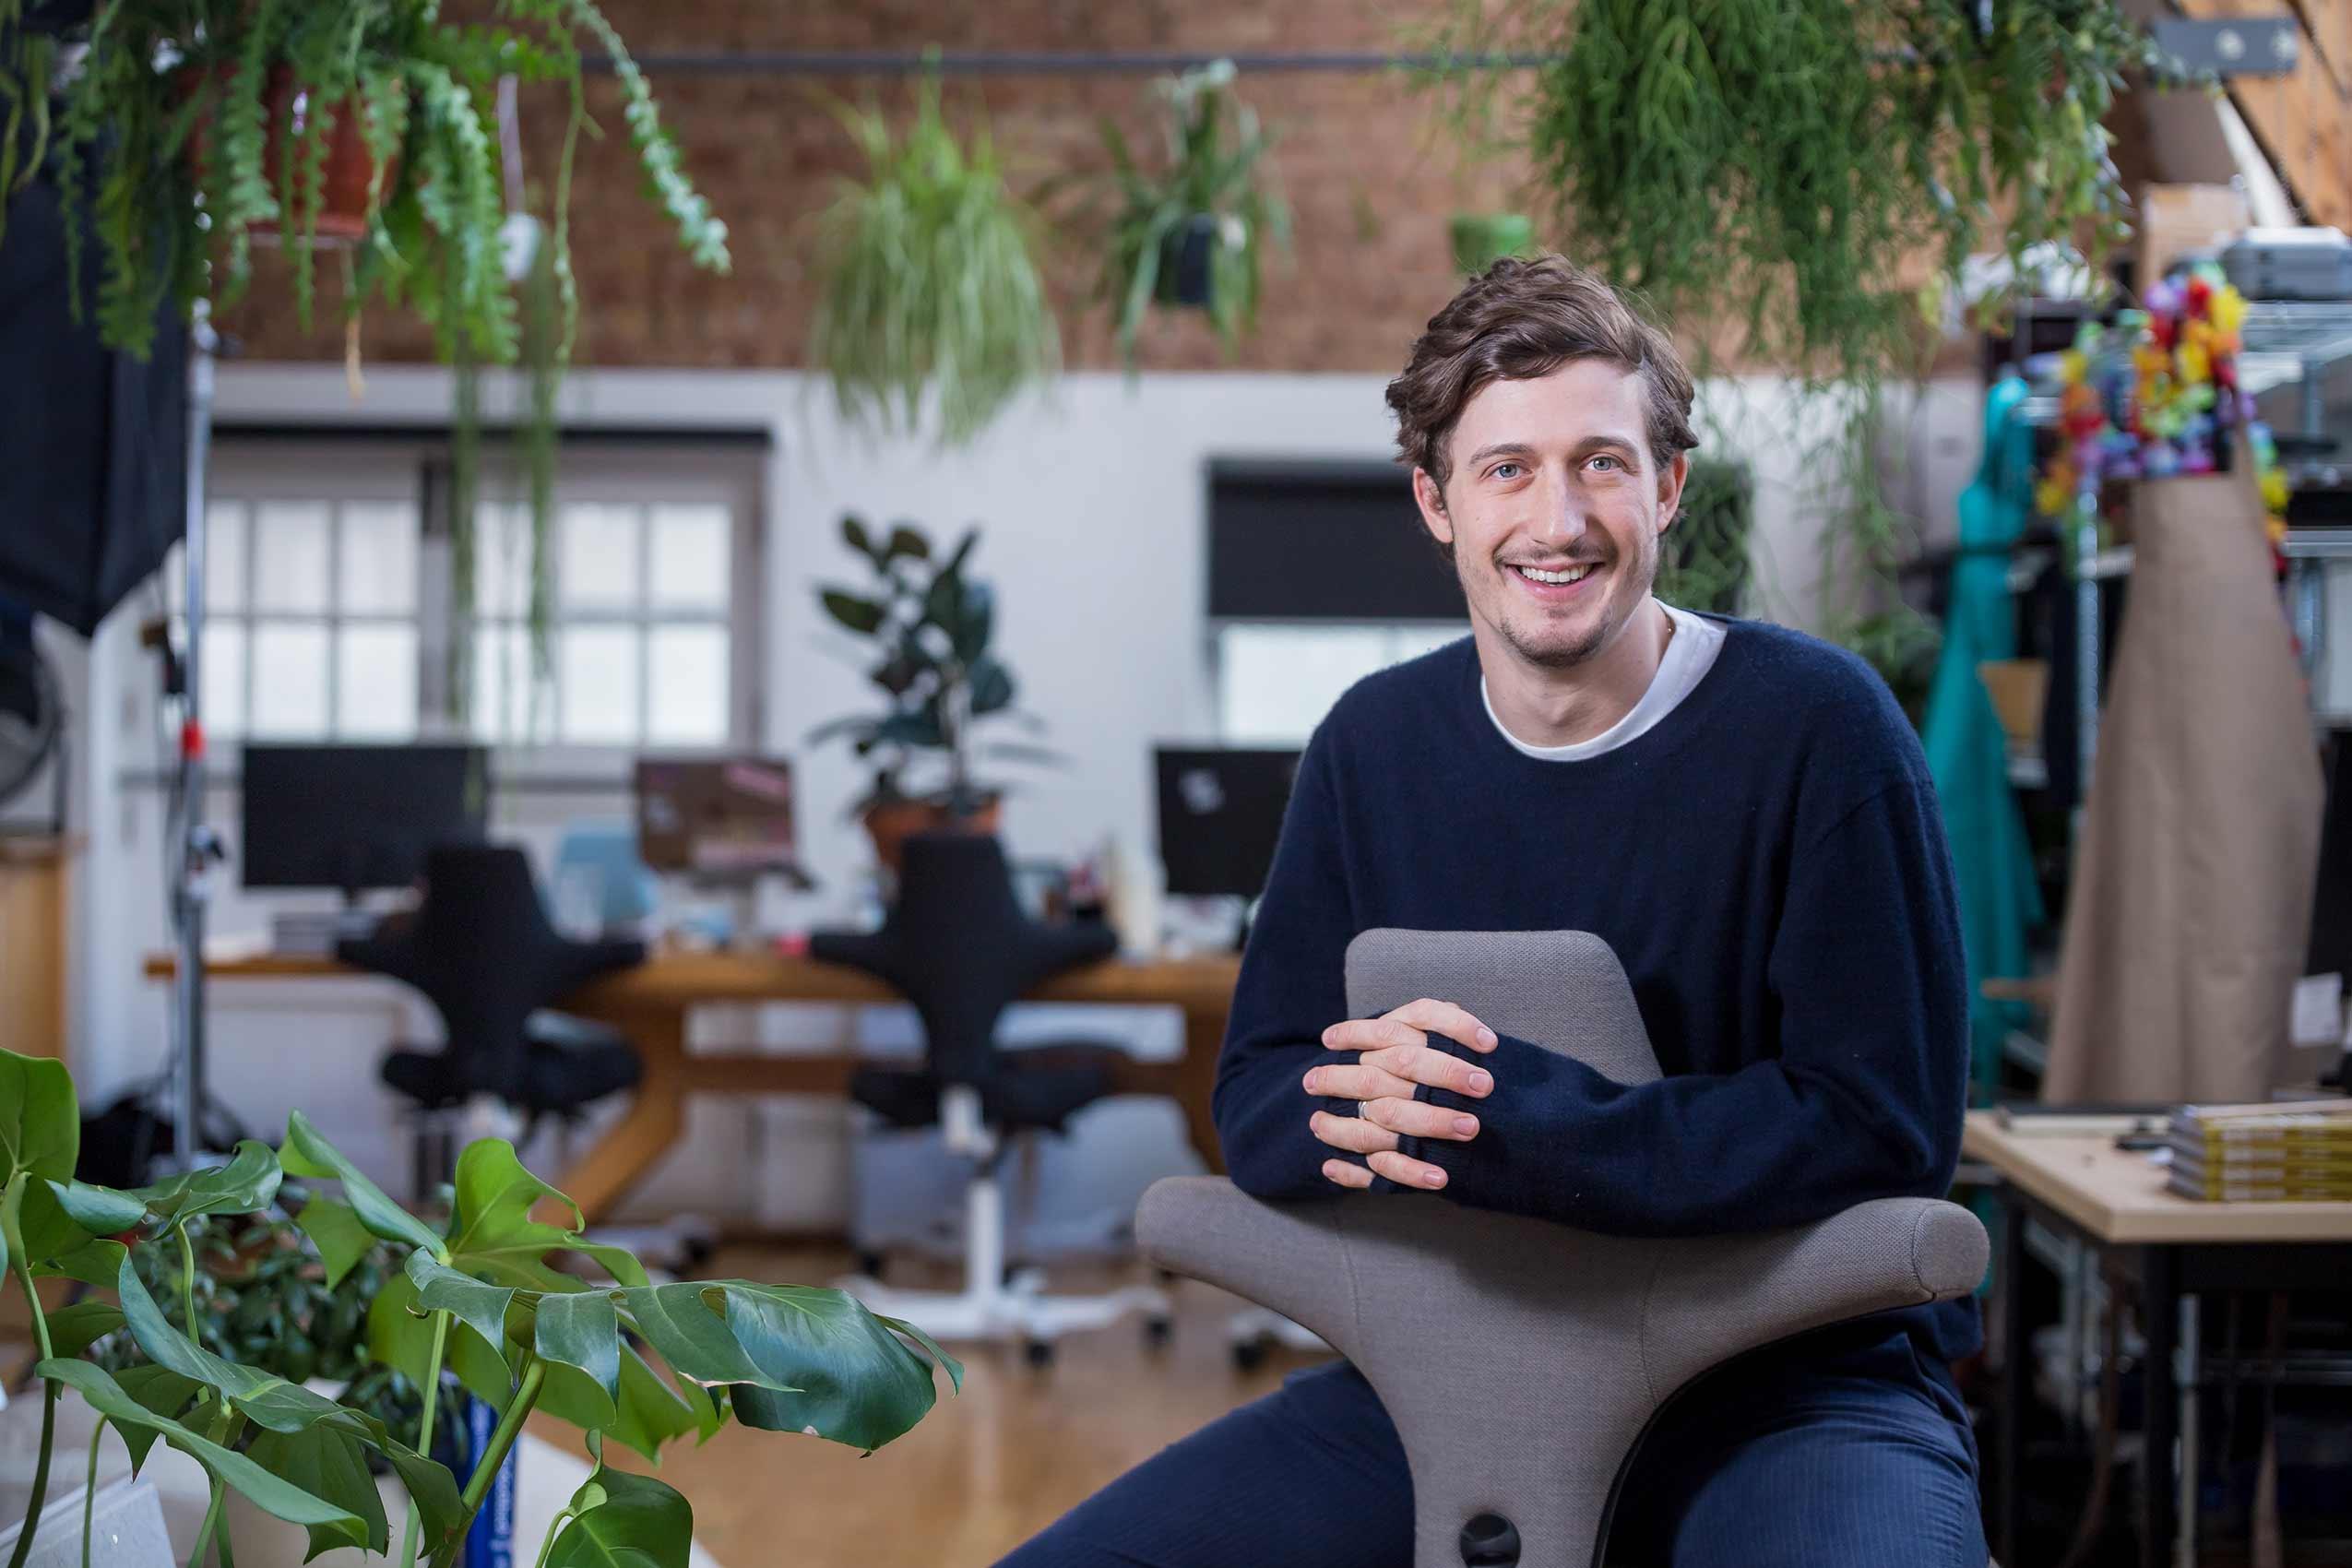 Ben Lebus founder of mob kitchen sitting on a hag capisco chair in kitchen studio